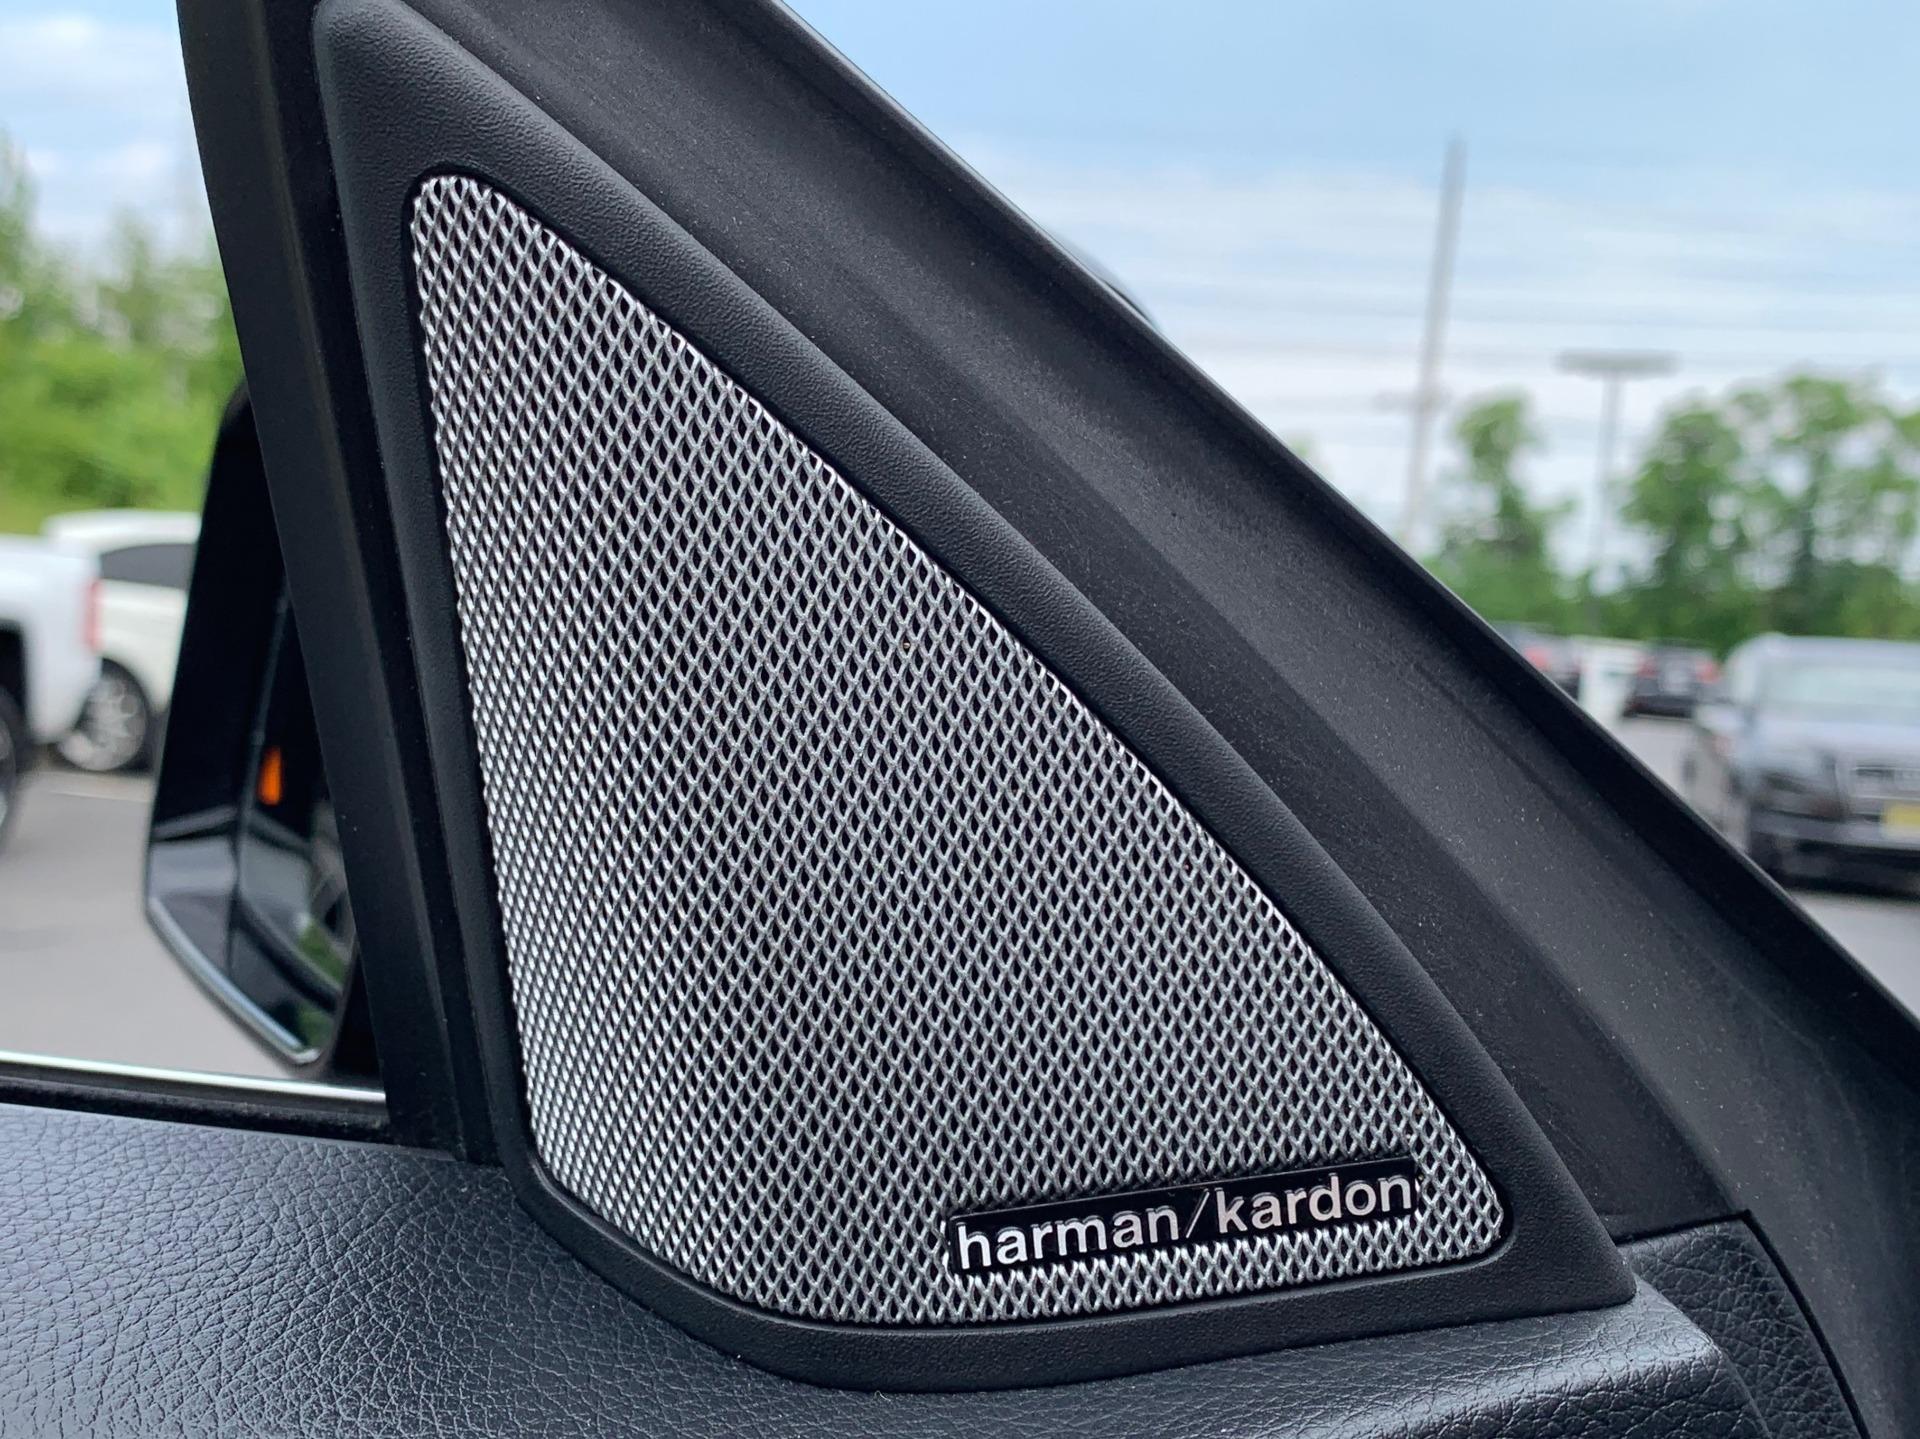 Used-2017-Mercedes-Benz-E-Class-E-400-Convertible-Sport-Edition